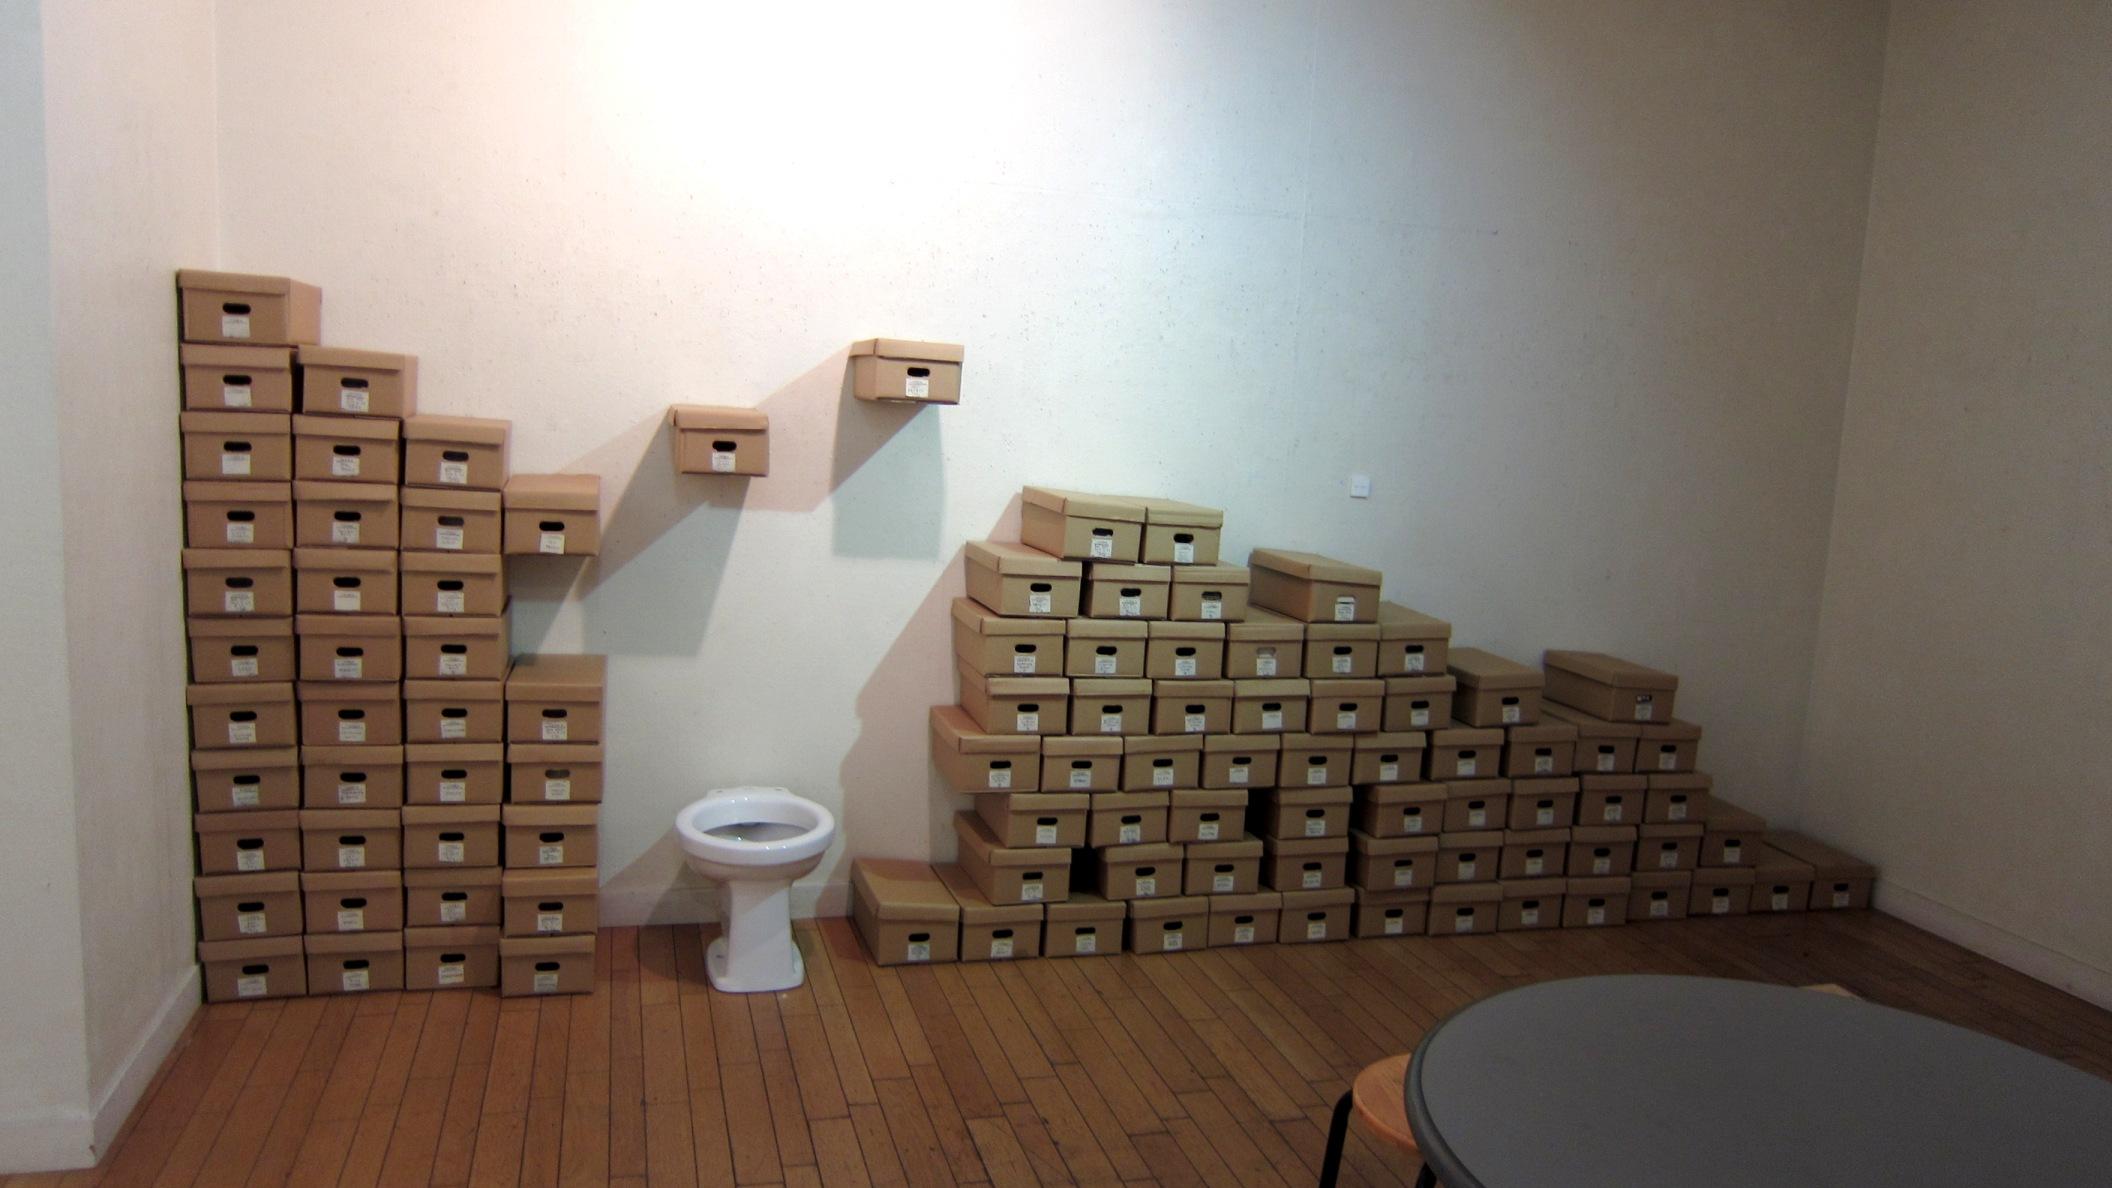 2240) 「BOX ART 7」 たぴお 終了/9月23日(月)~9月28日(土)_f0126829_10314365.jpg